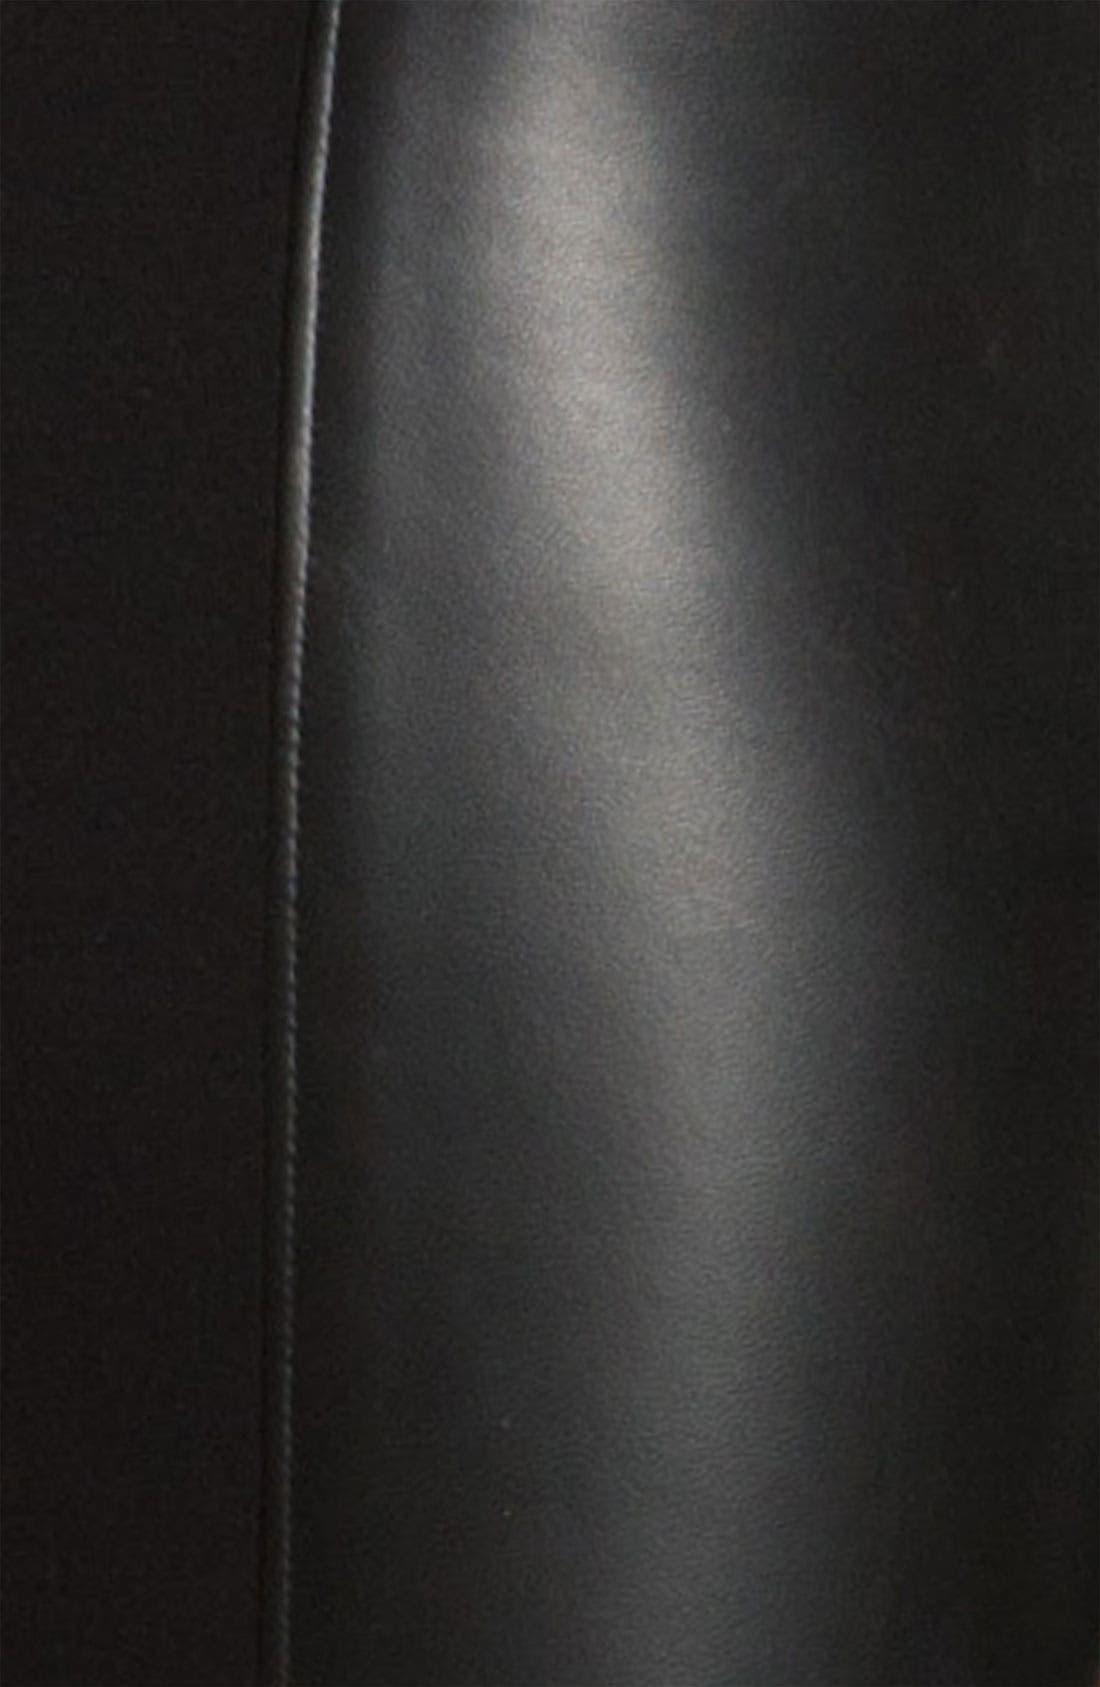 PAIGE BLACK LABEL,                             'Paloma' Leather Panel Leggings,                             Alternate thumbnail 3, color,                             001